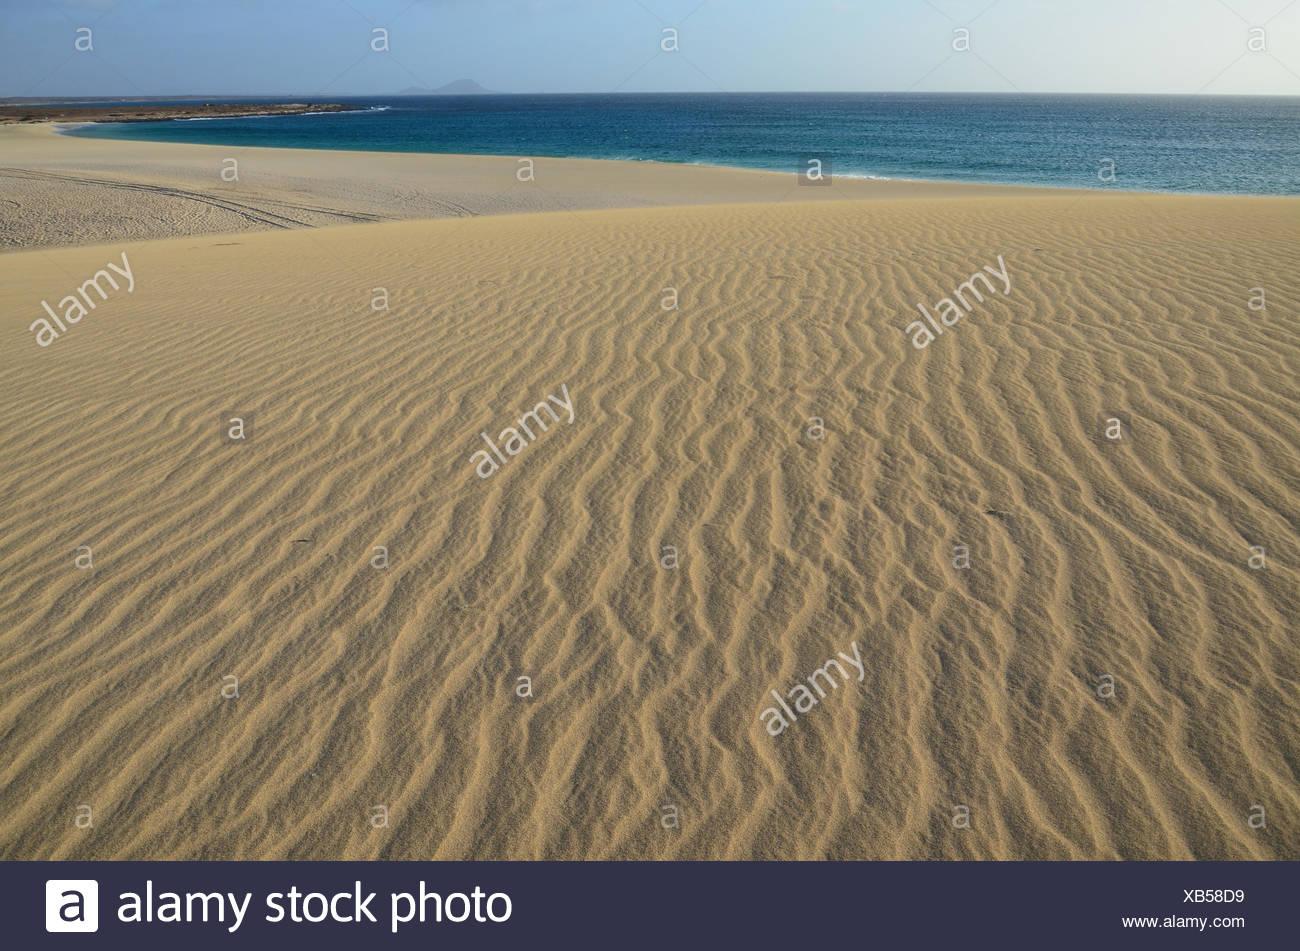 Cape Verde, Cape Verde Islands, sal, ponta preta, sand, dunes, sea, waves, Atlantic, beach, seashore, sand beach, lines, structur Stock Photo